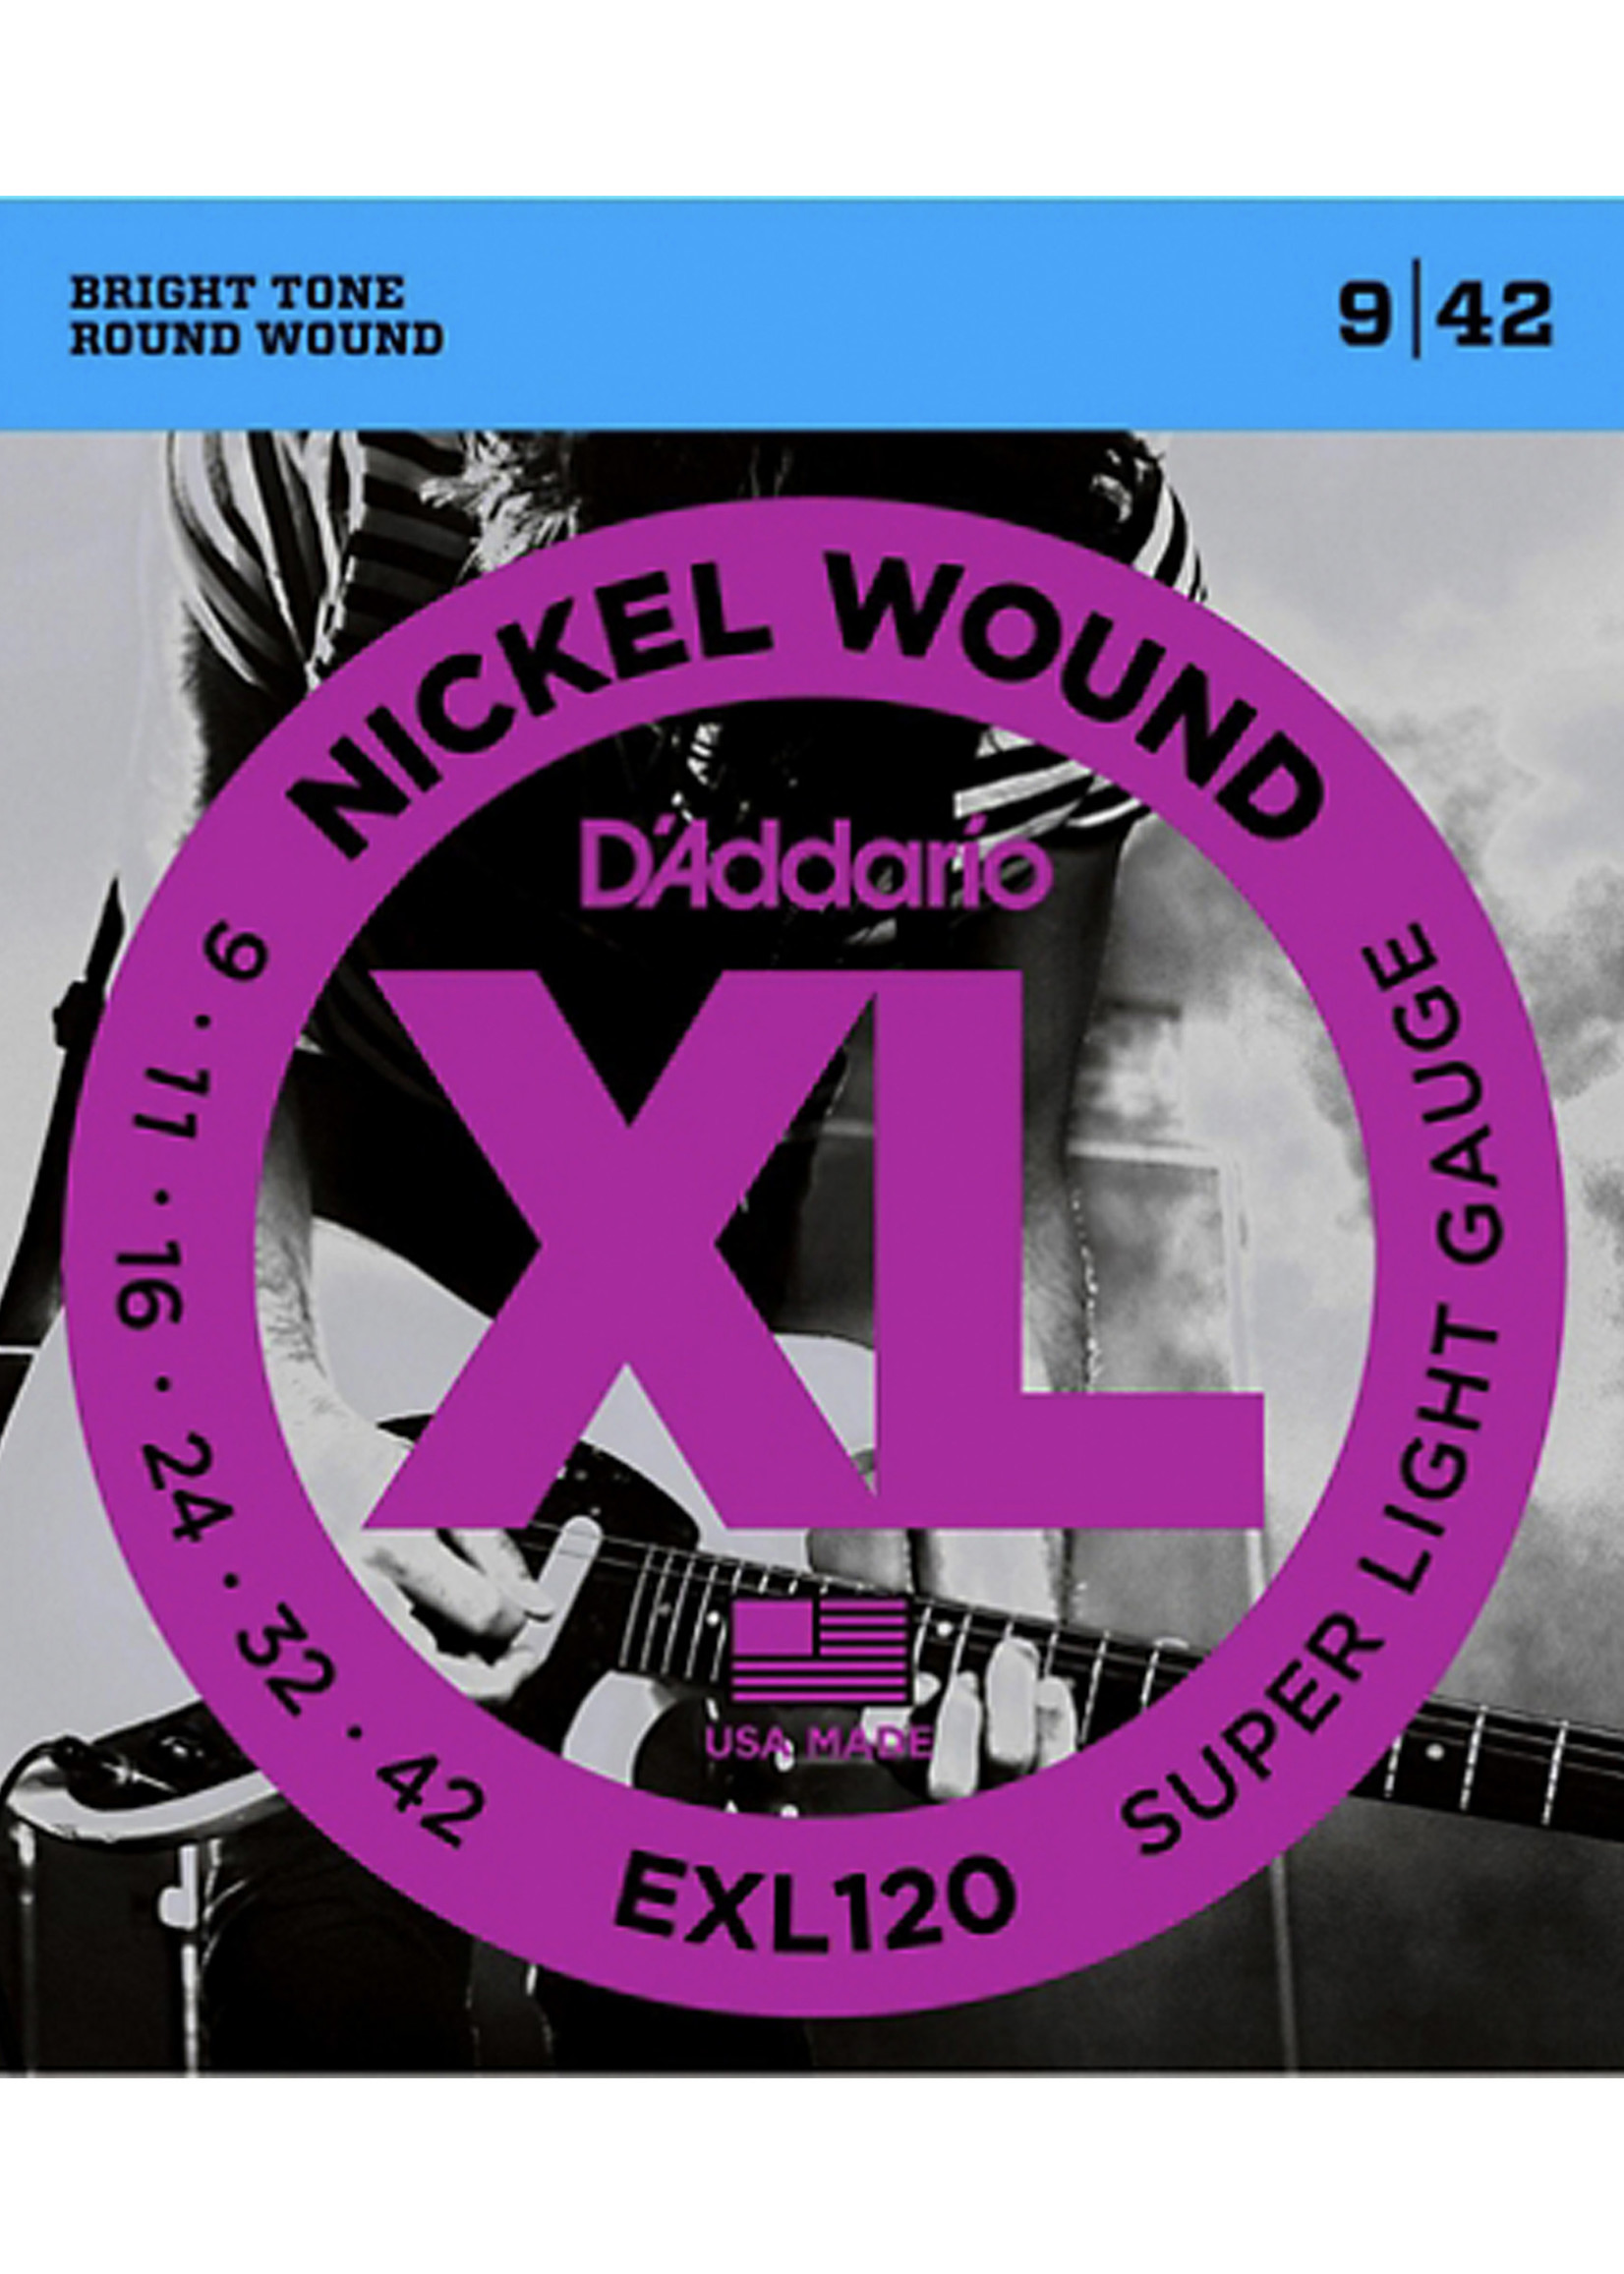 DAddario Fretted D'Addario EXL120 9-42